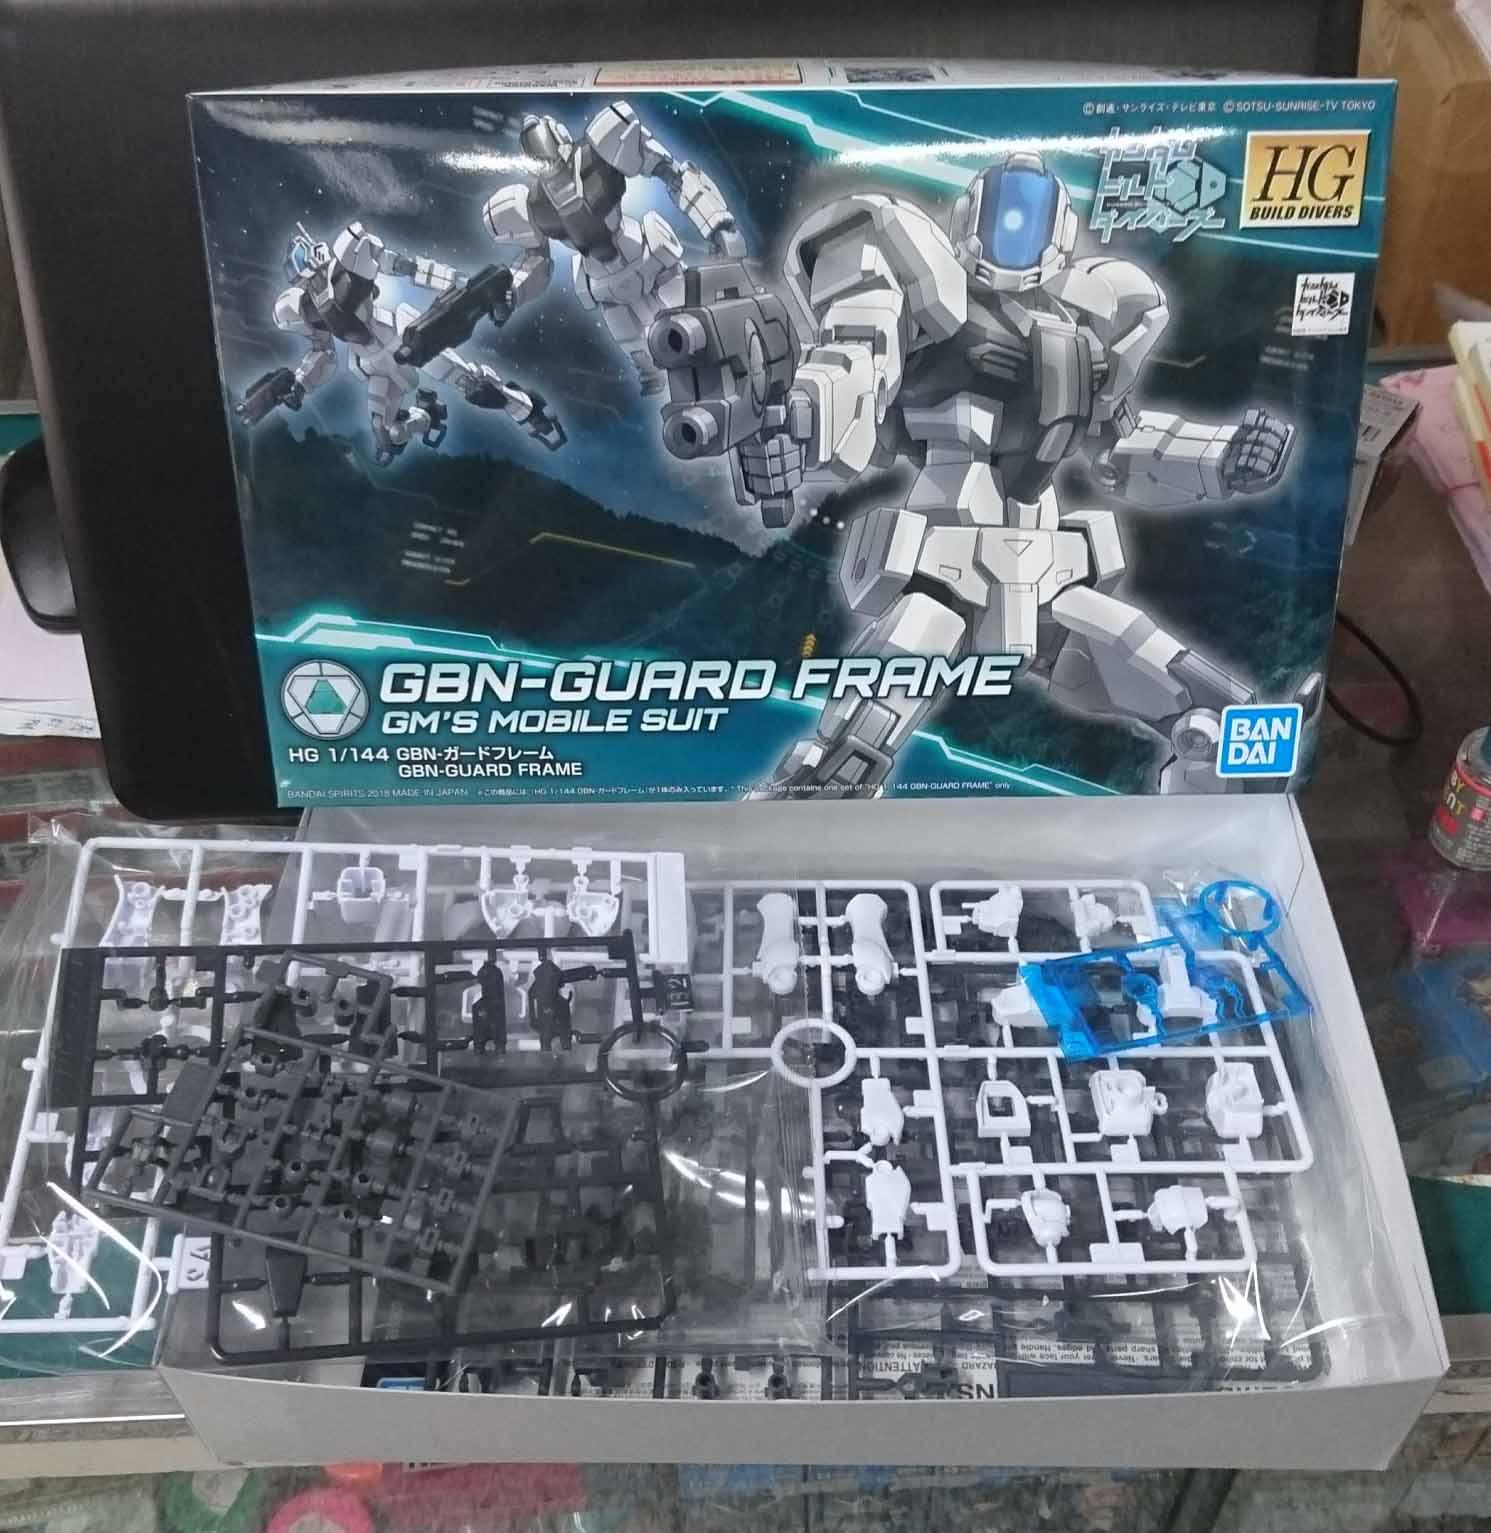 HGBD 1/144 GBN警衛機,益祥模型玩具 外盒及零件實際拍攝照片。